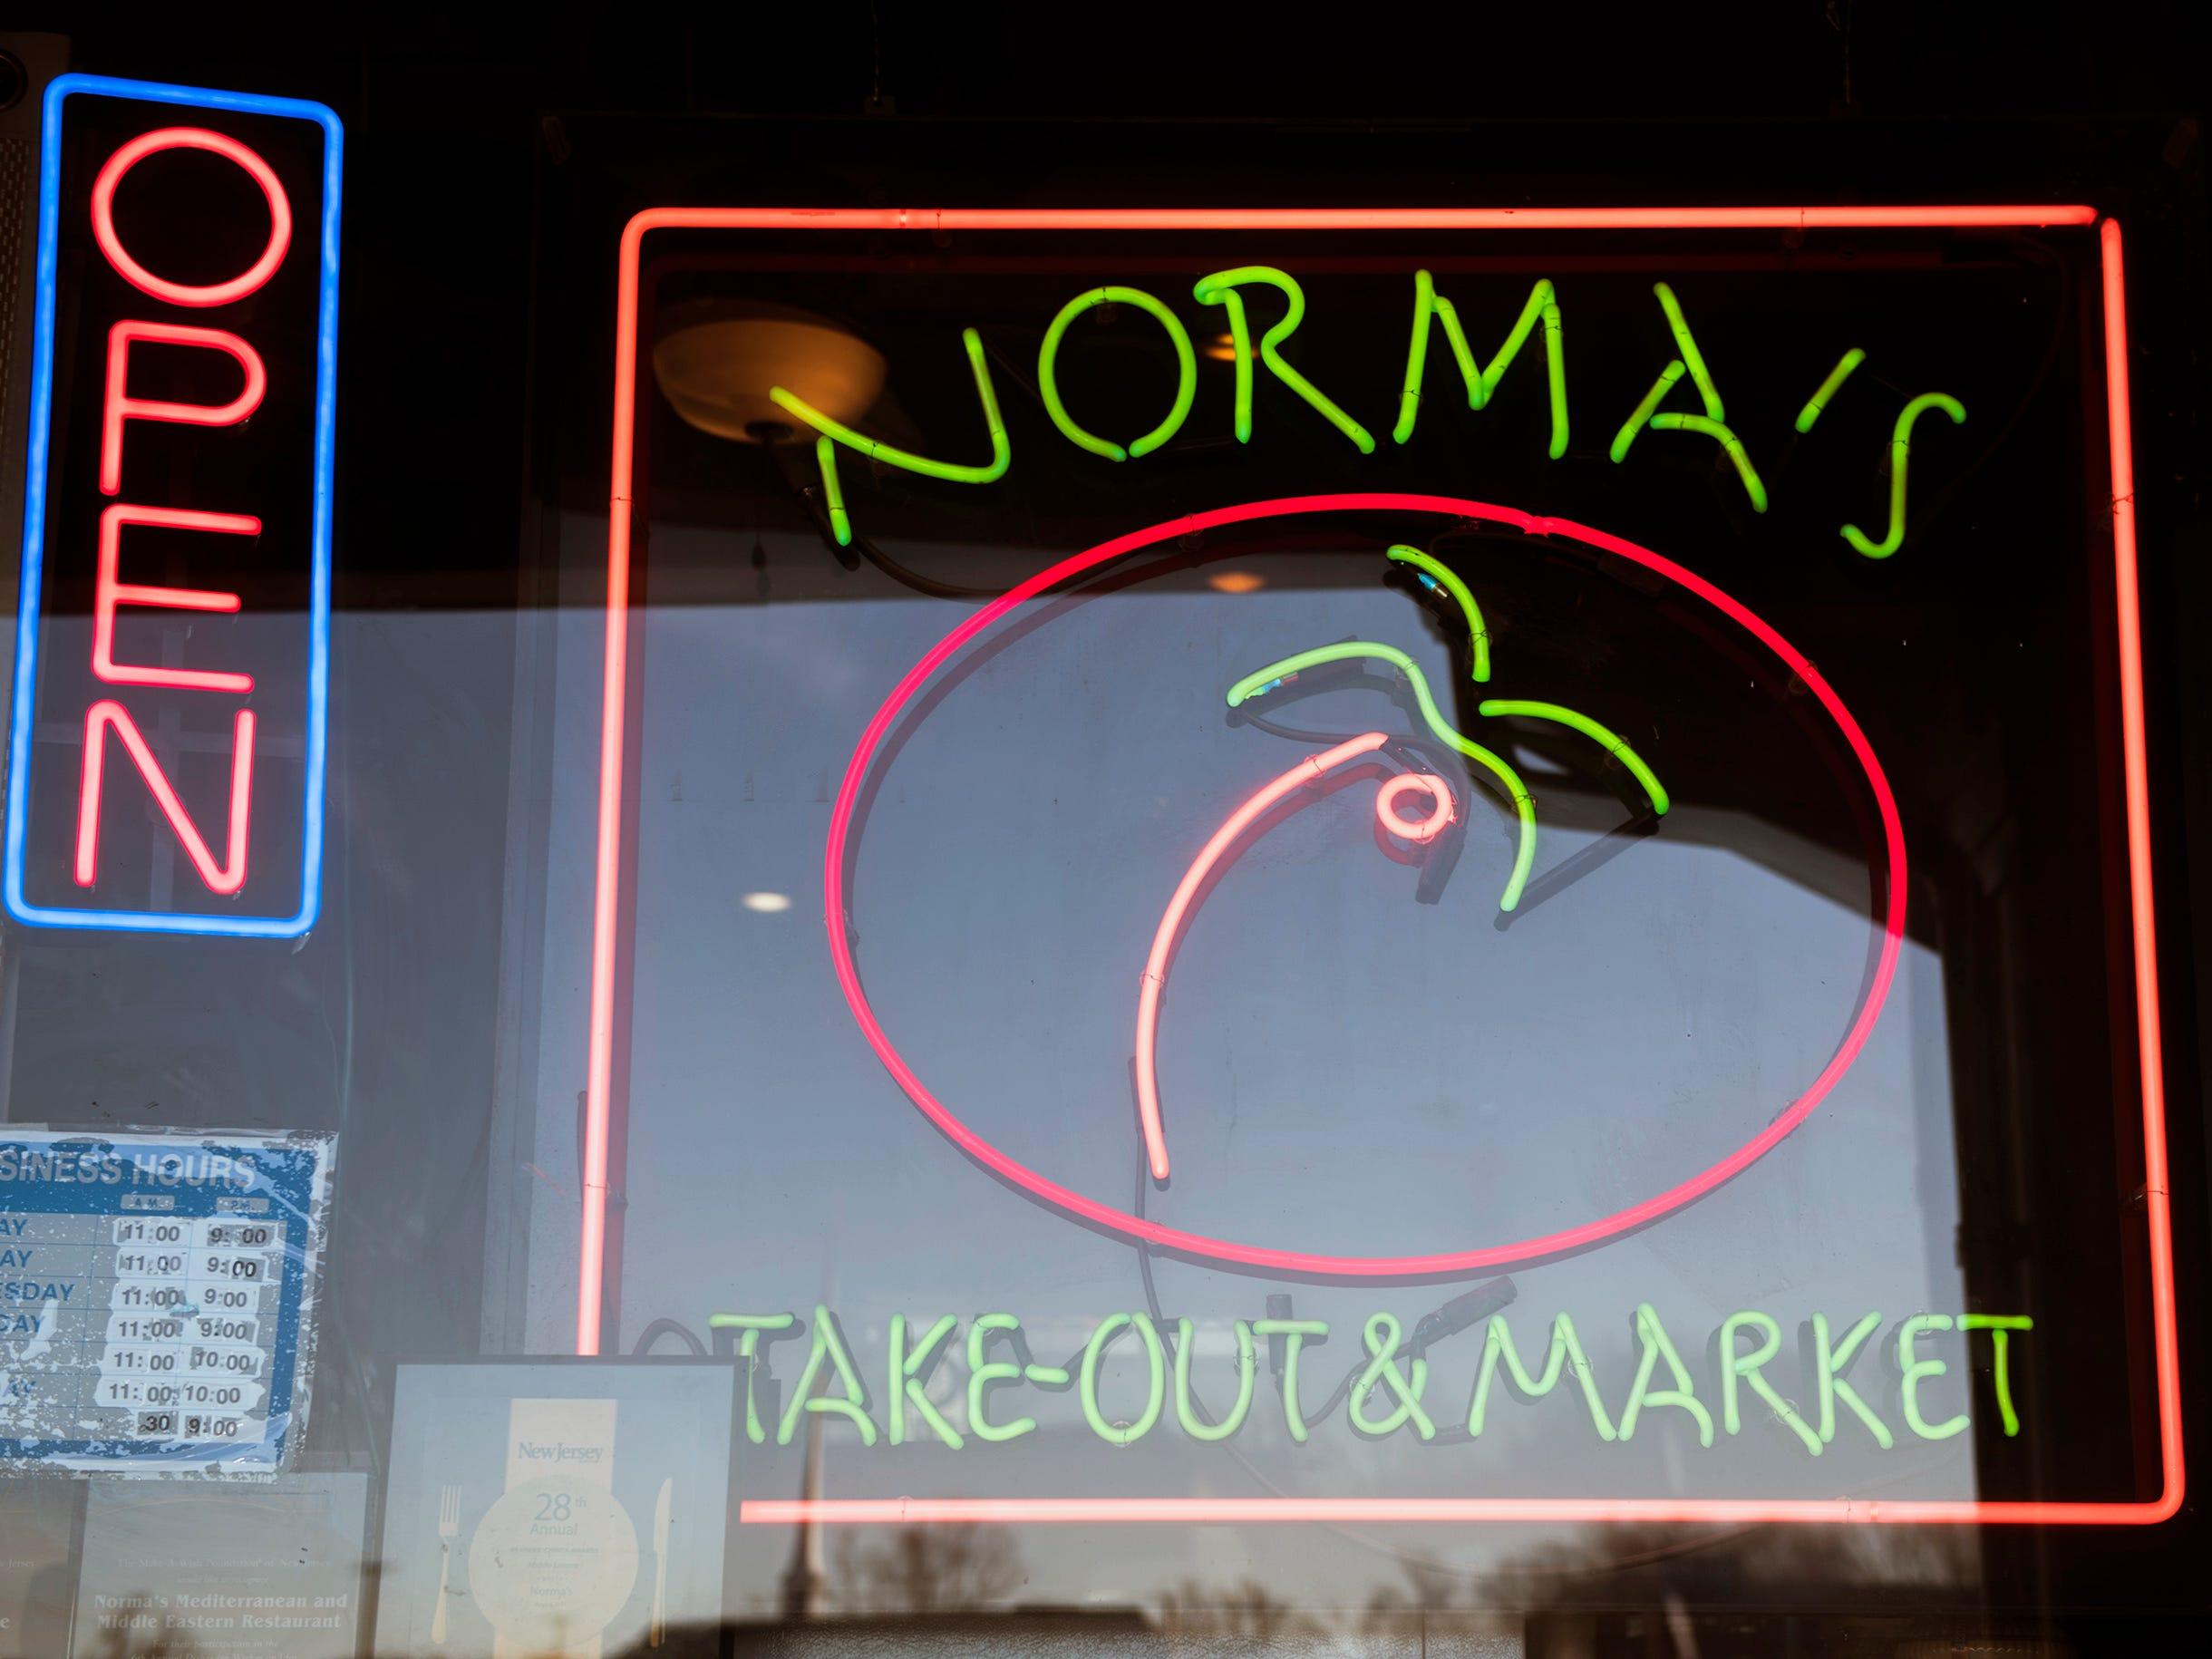 Norma's Eastern Mediterranean Cuisine in Cherry Hill.